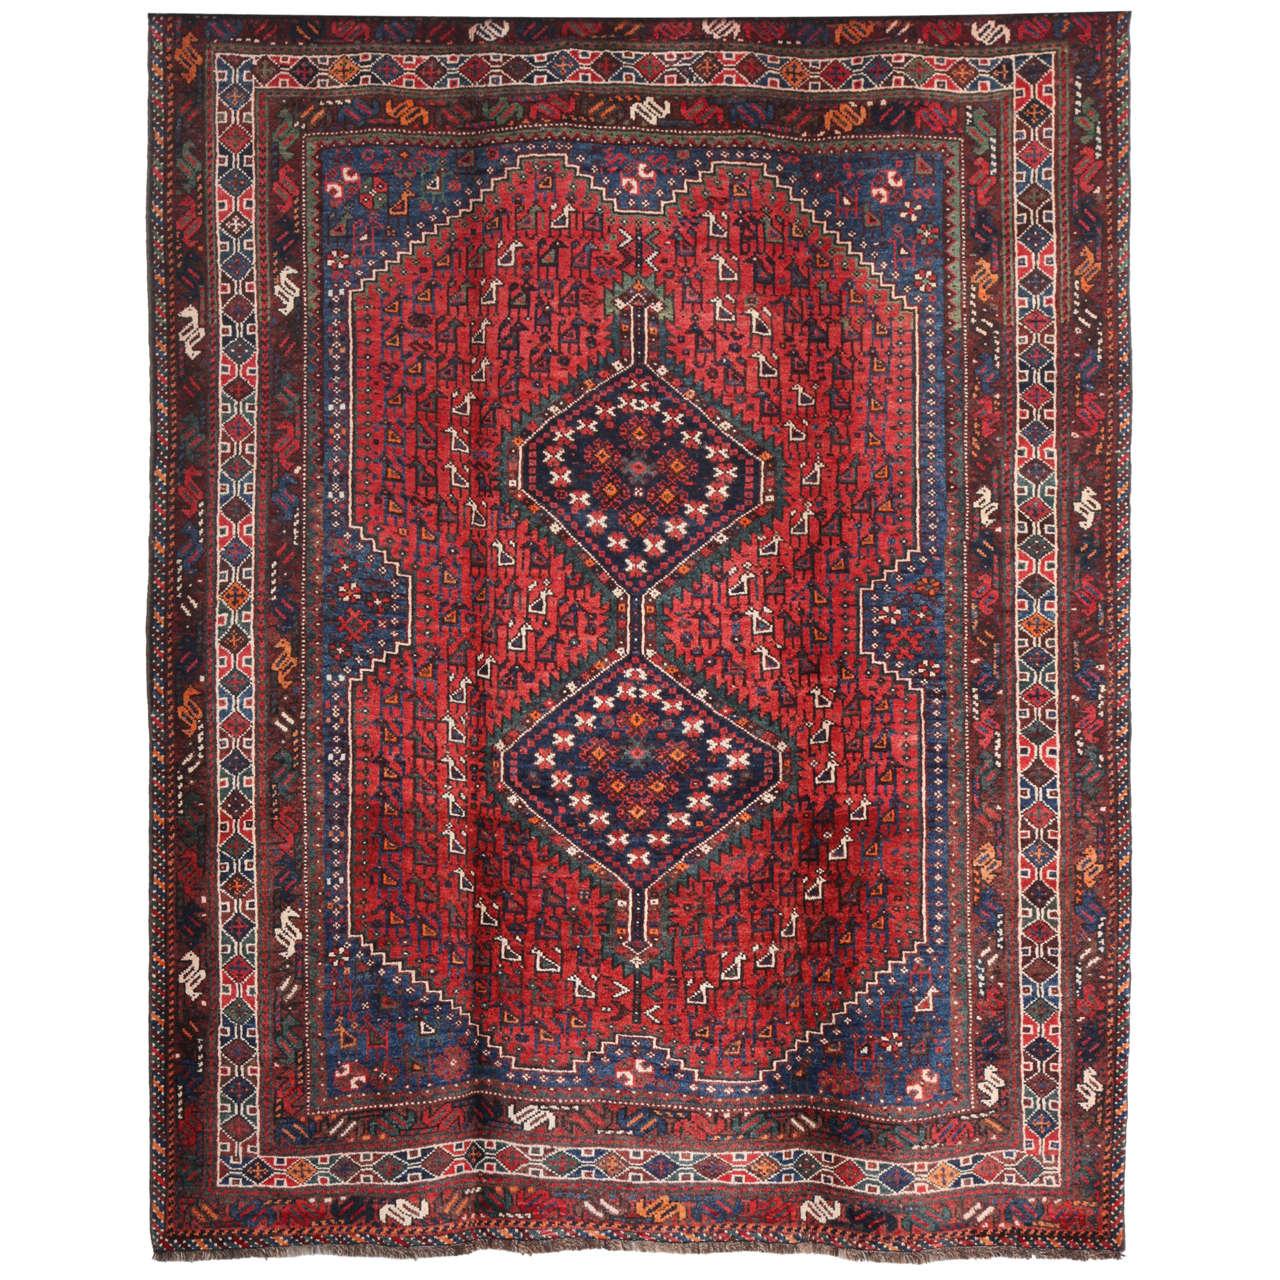 Persian Qashqai Carpet, circa 1920 in Pure Handspun Wool and Vegetable Dyes